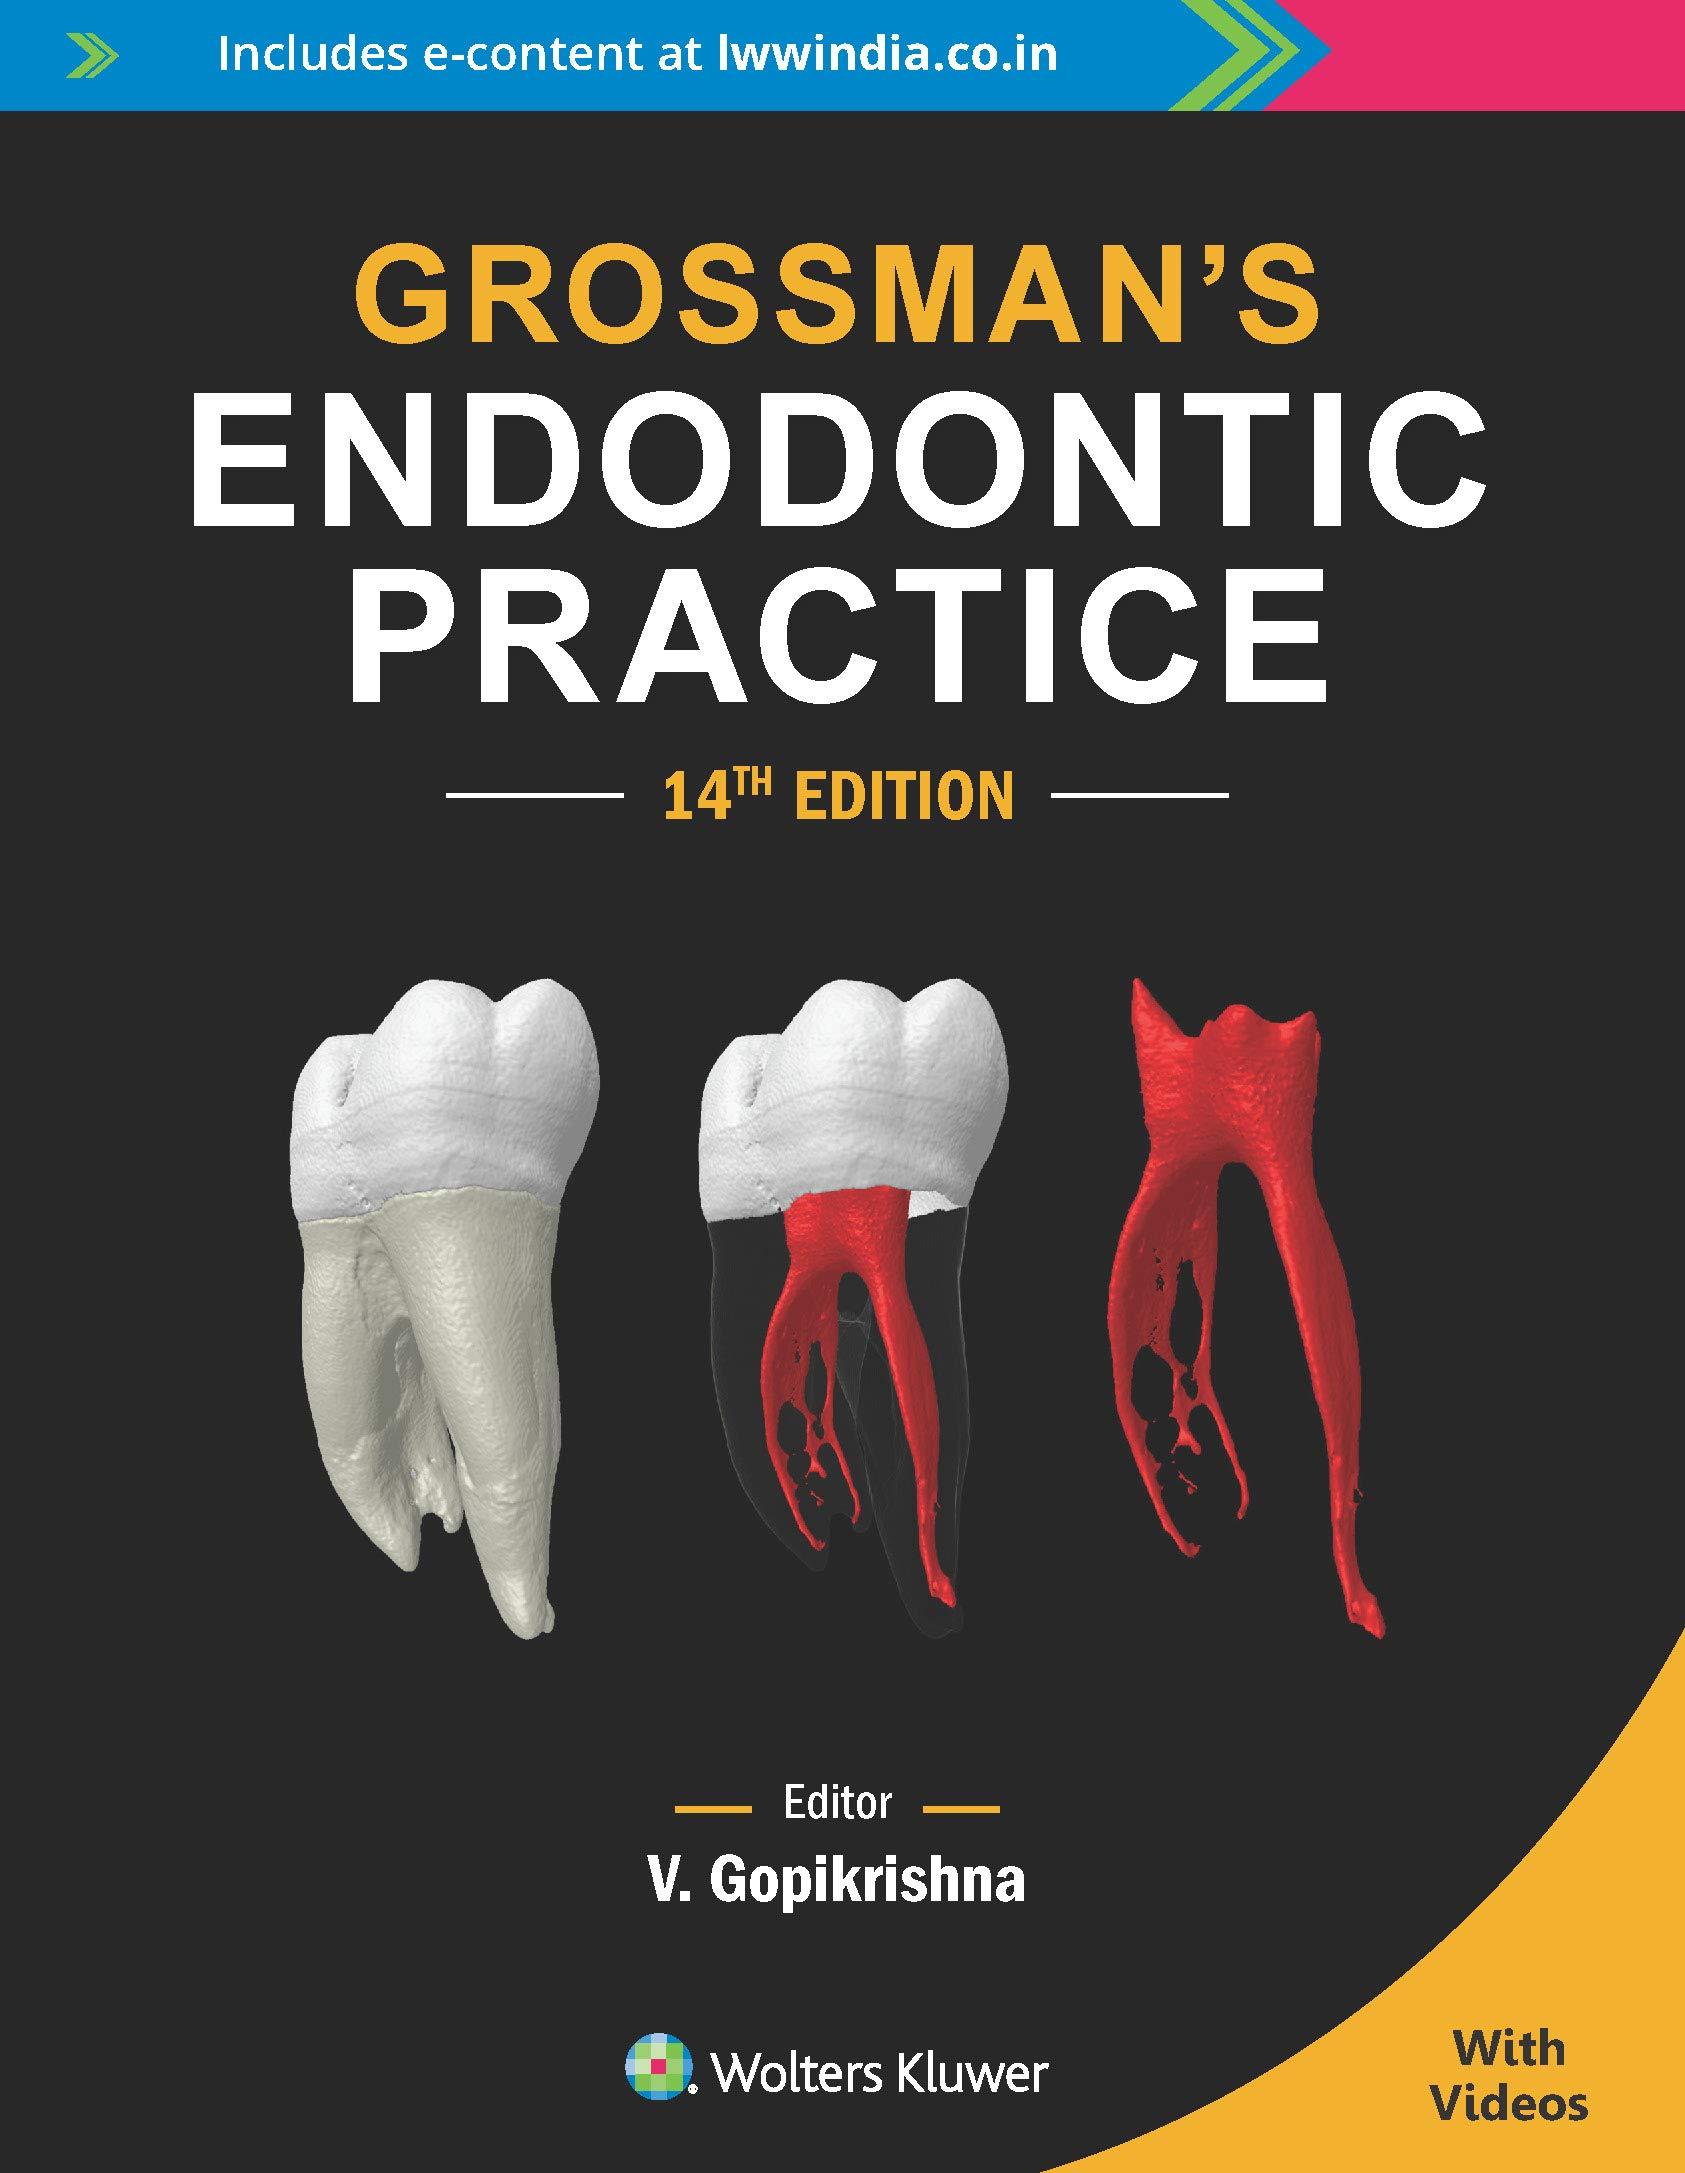 Grossman's Endodontic Practice, 14th edition